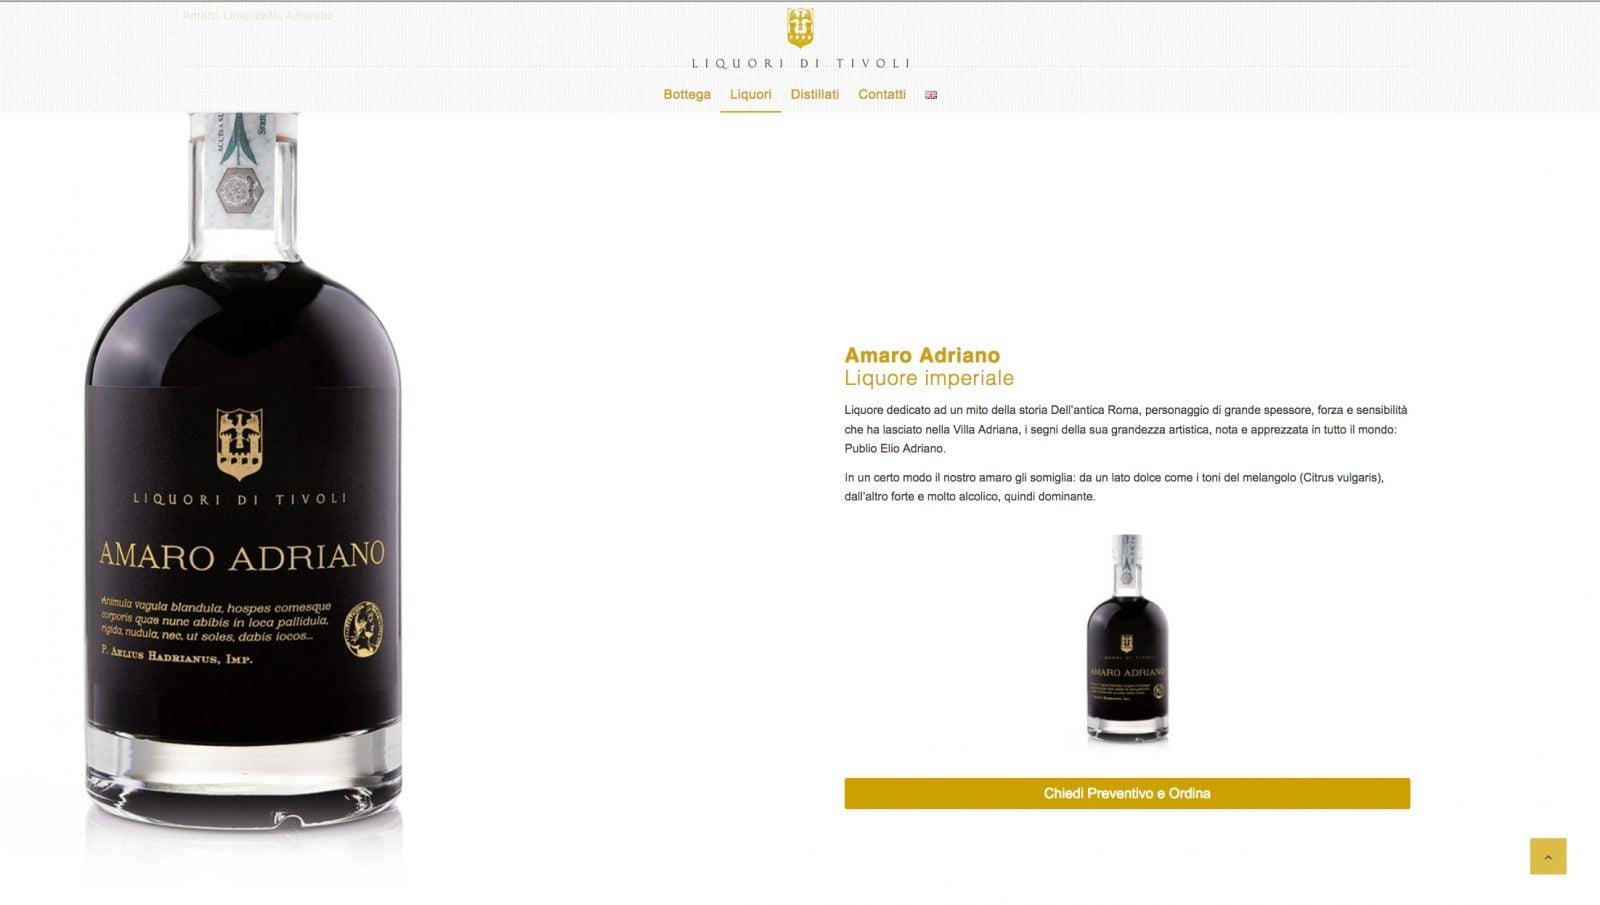 LIQUORI di TIVOLI - product